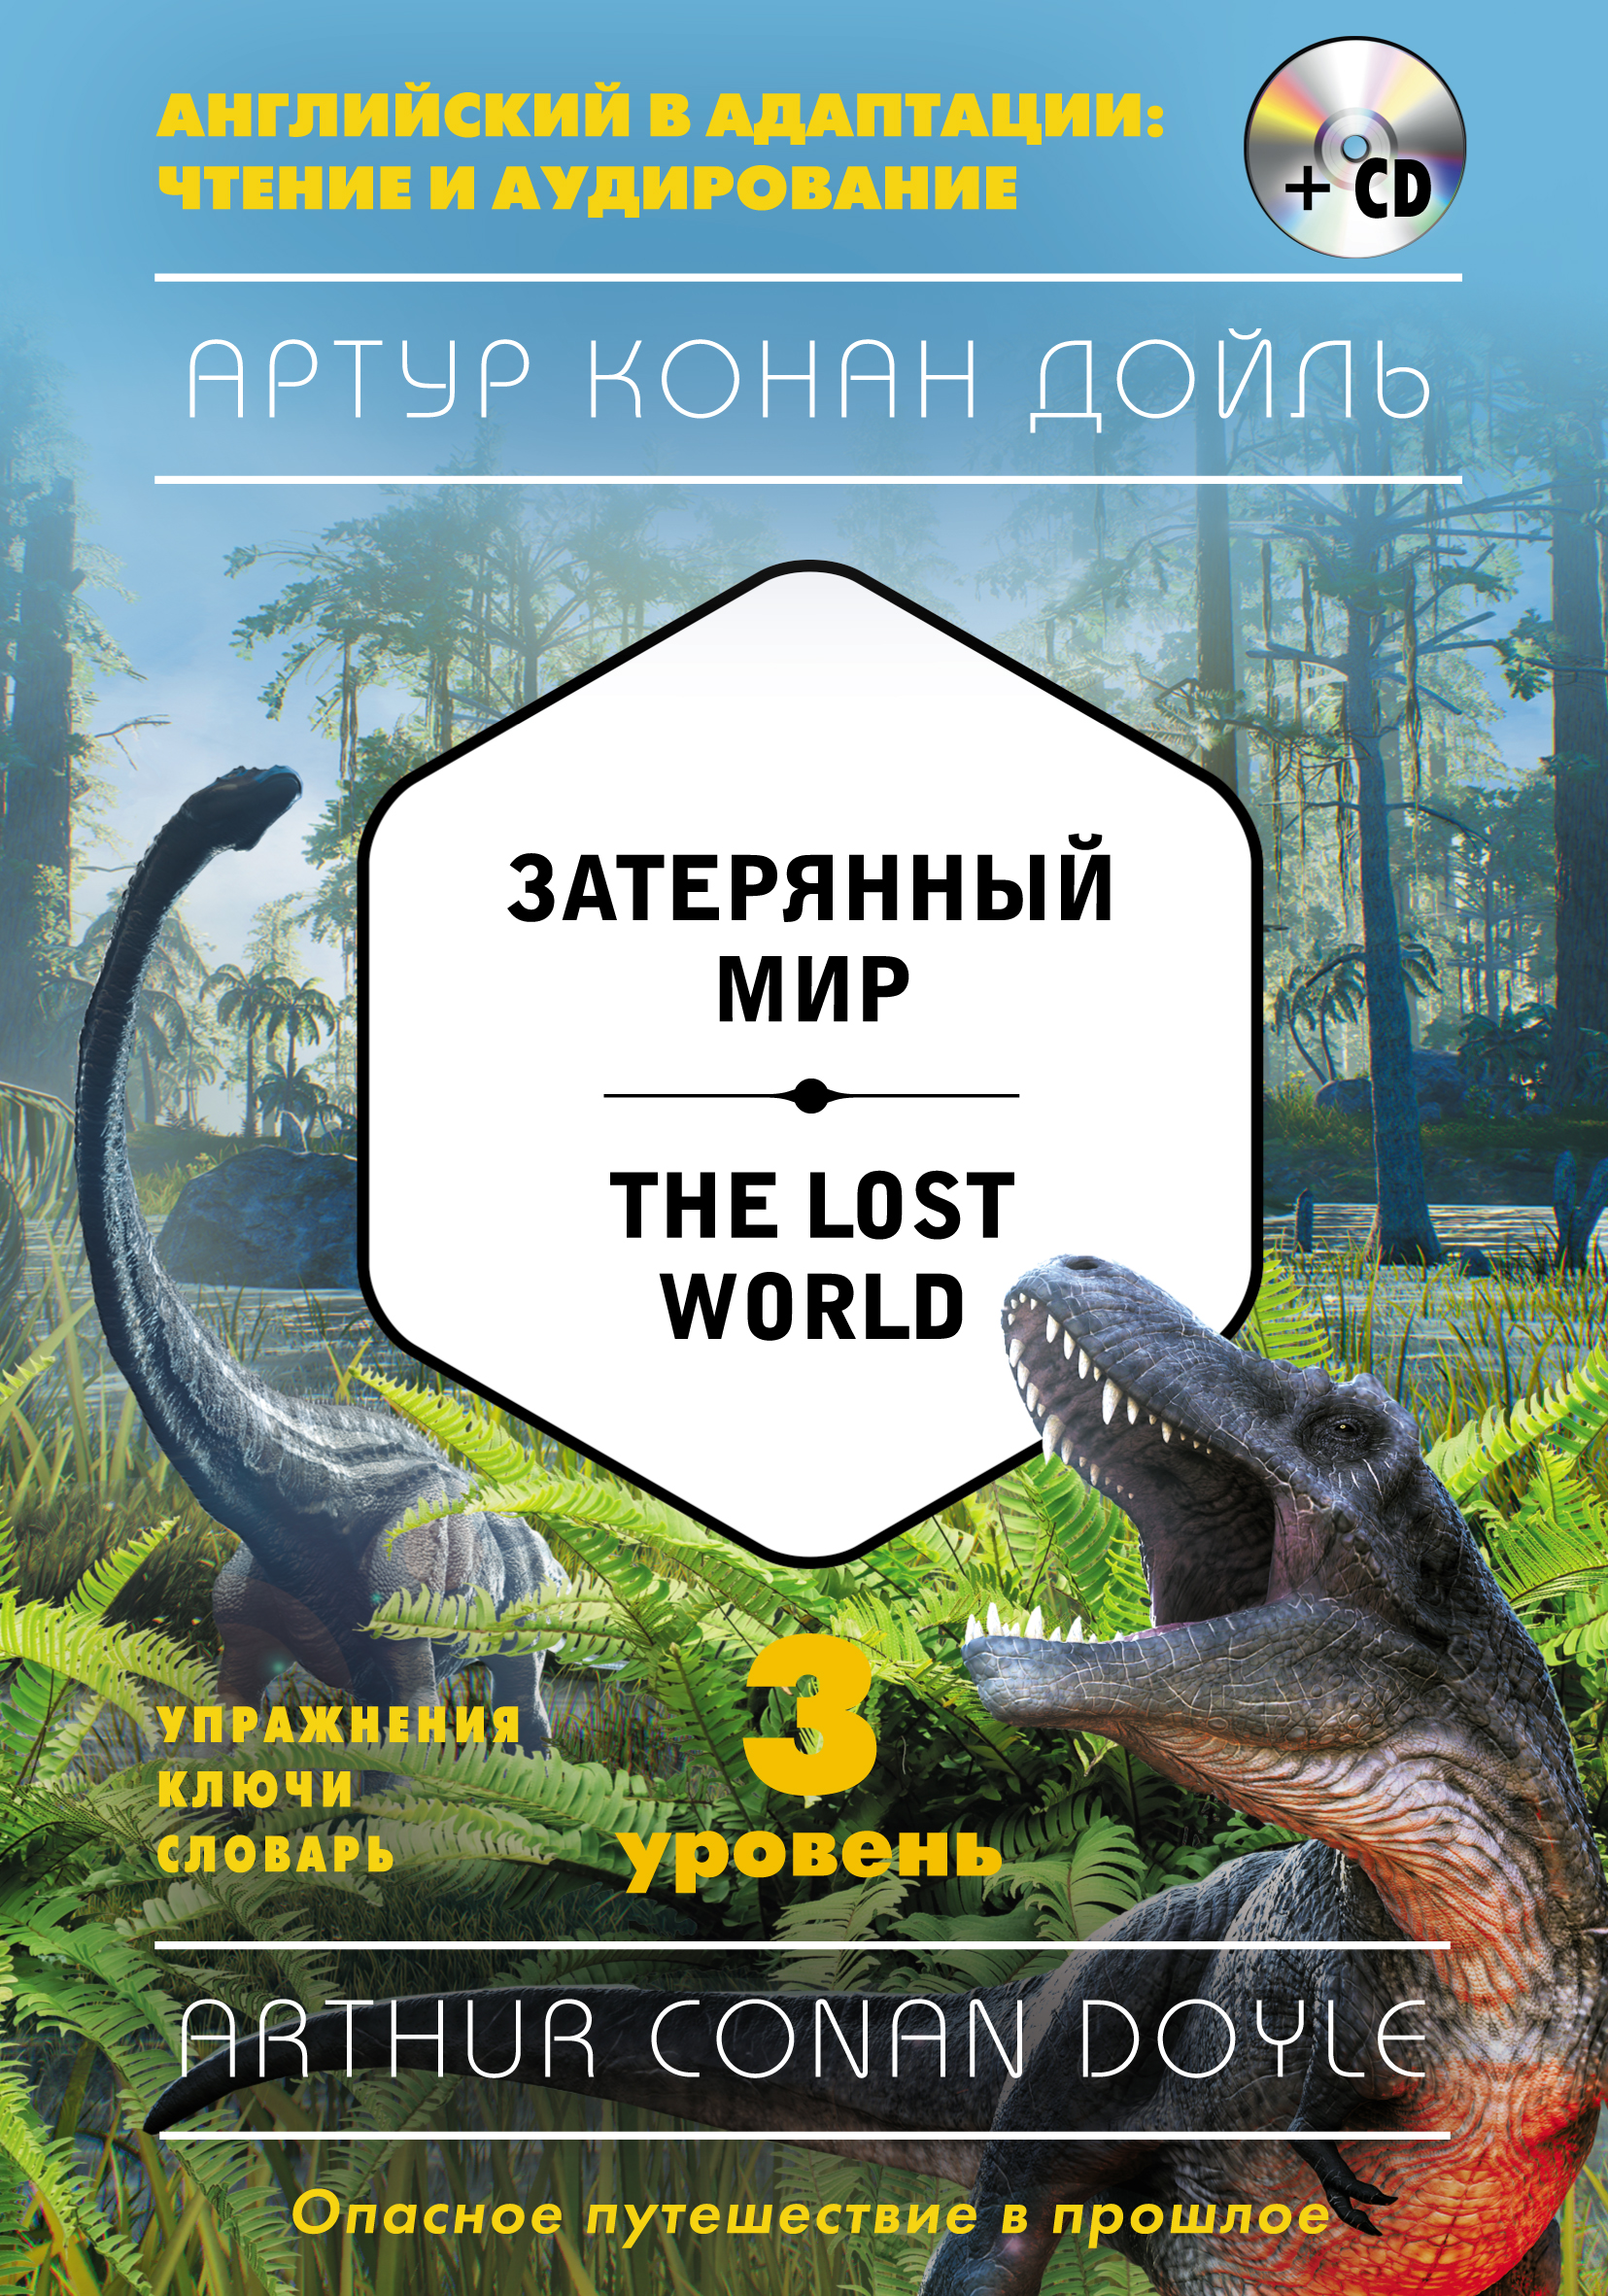 Артур Конан Дойл Затерянный мир / The Lost World. 3 уровень (+ MP3) дойль а затерянный мир the lost world 3 уровень упражнения ключи словари cd